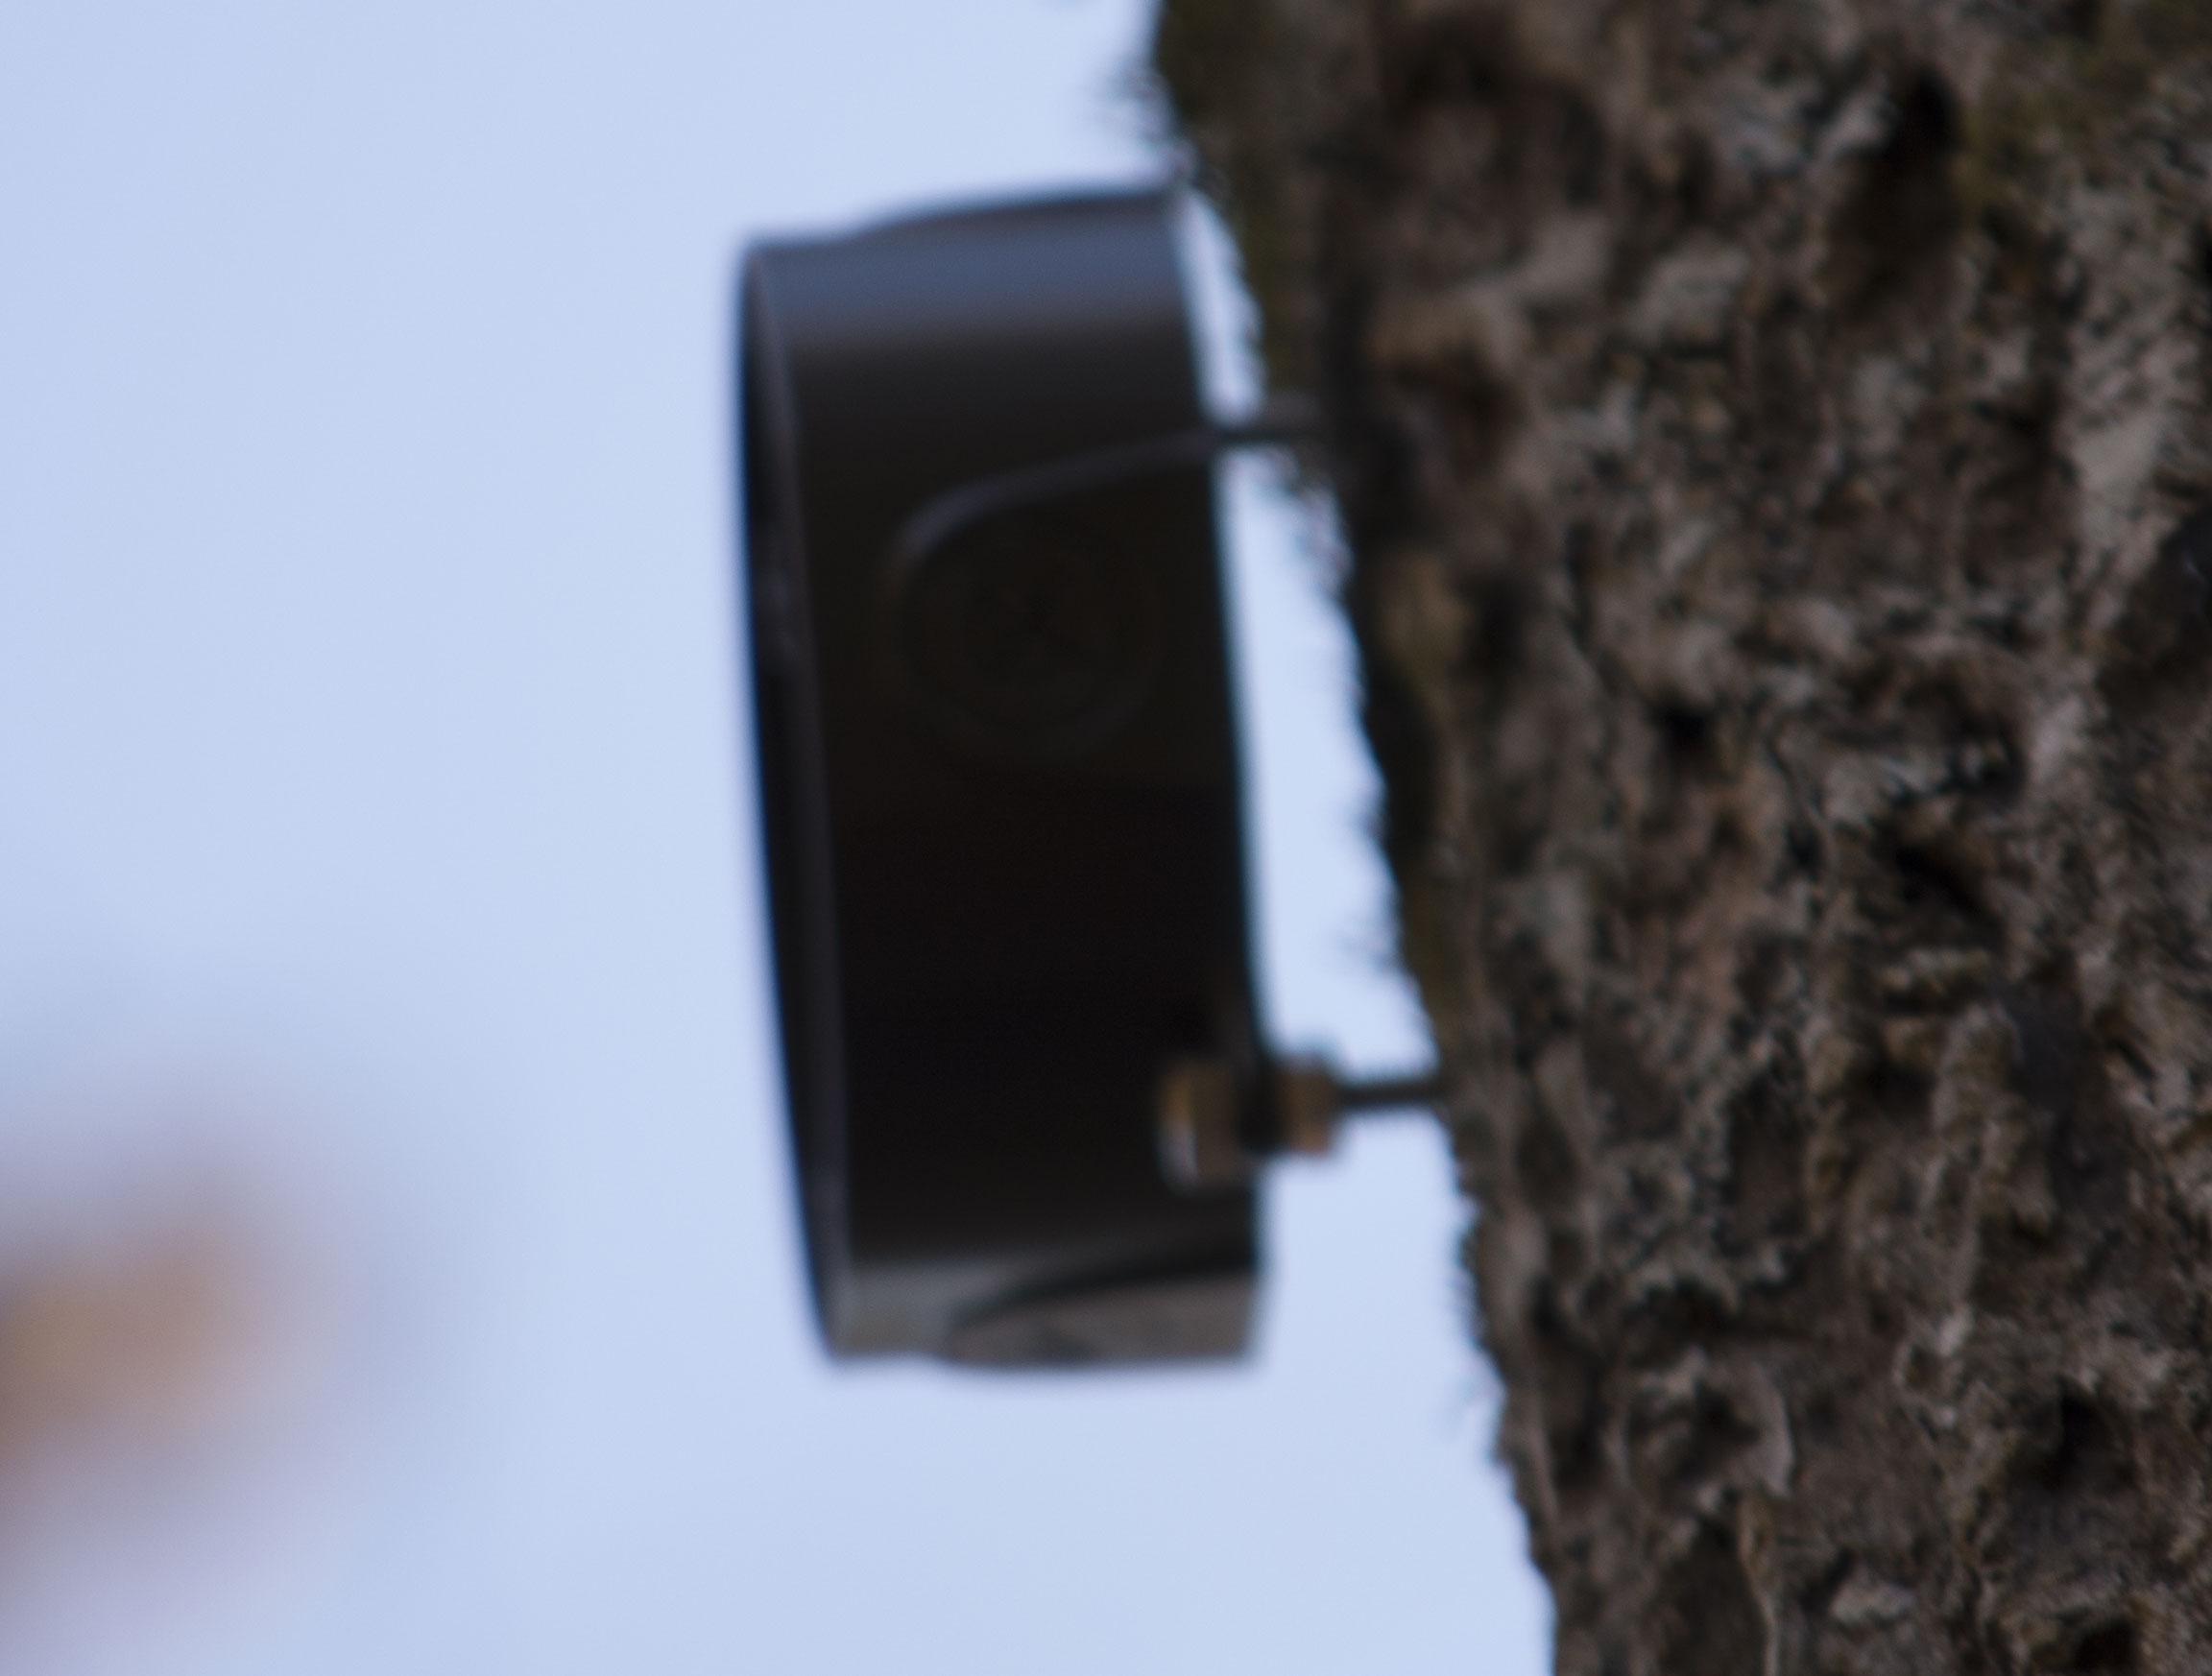 Junction Box On Tree